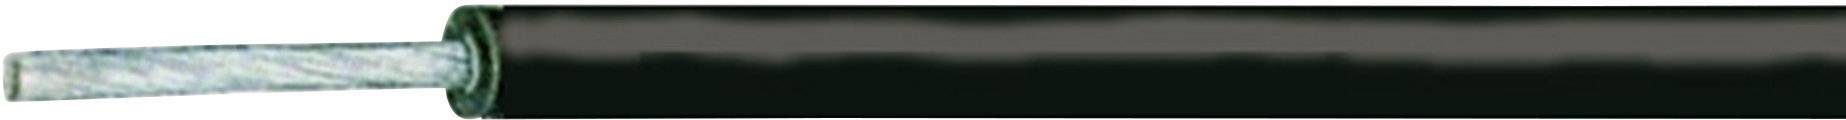 Stikalna žica SiL-SiAF 1 x 1.50 mm, modra XBK Kabel cena za meter